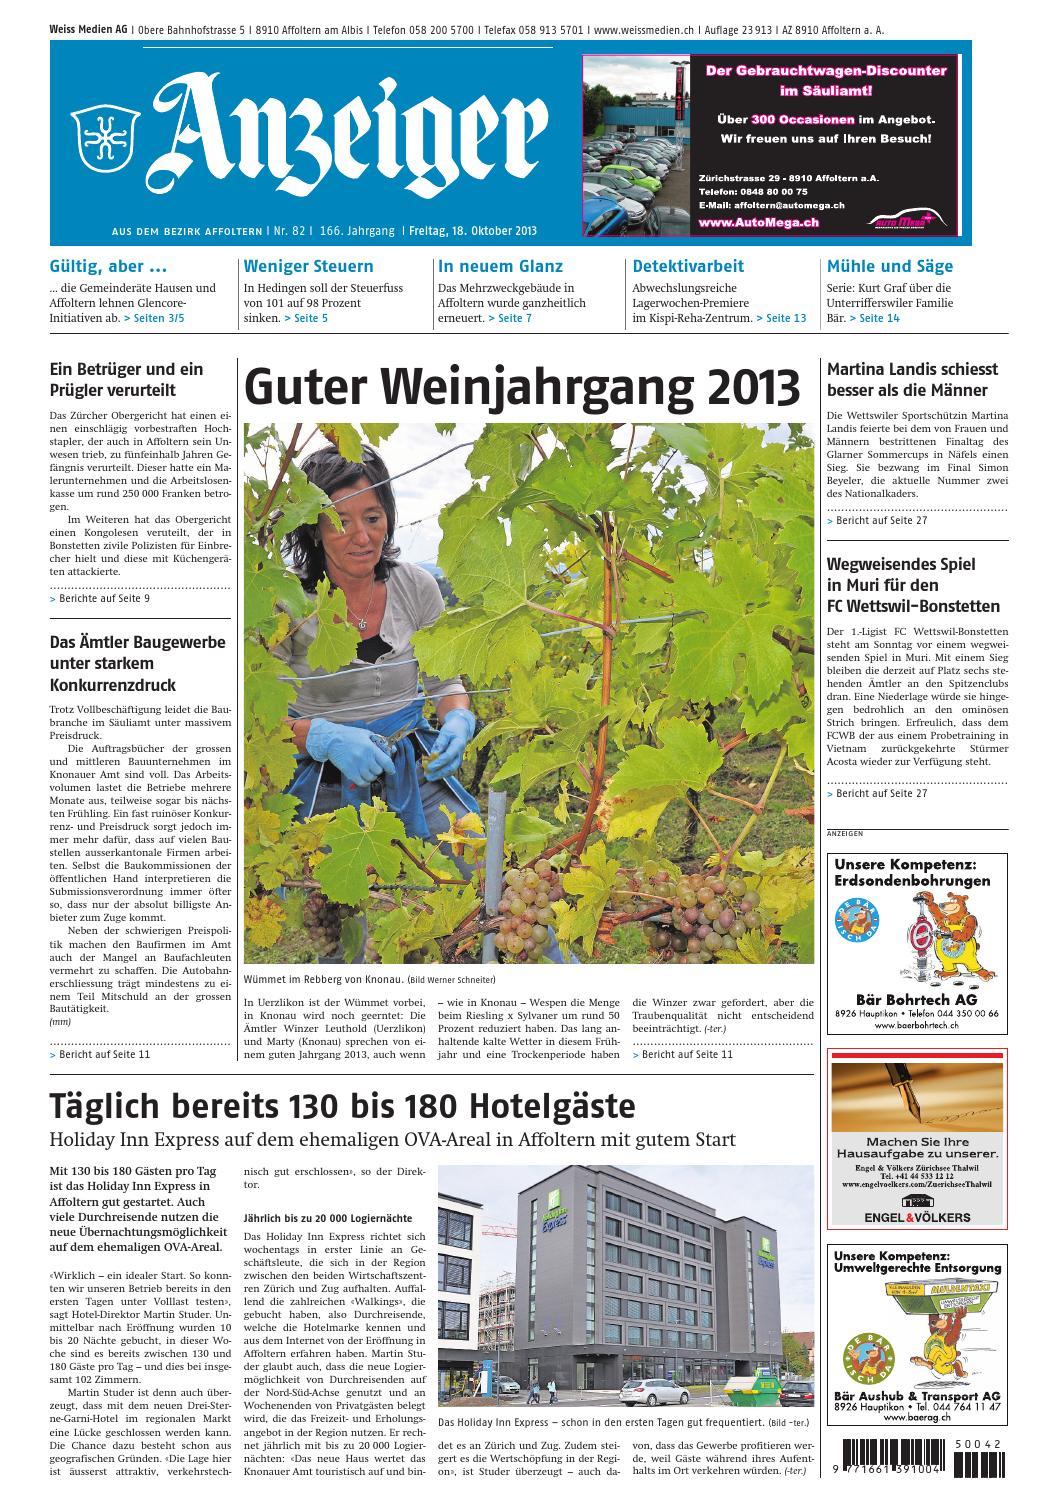 082 2013 by AZ-Anzeiger - issuu